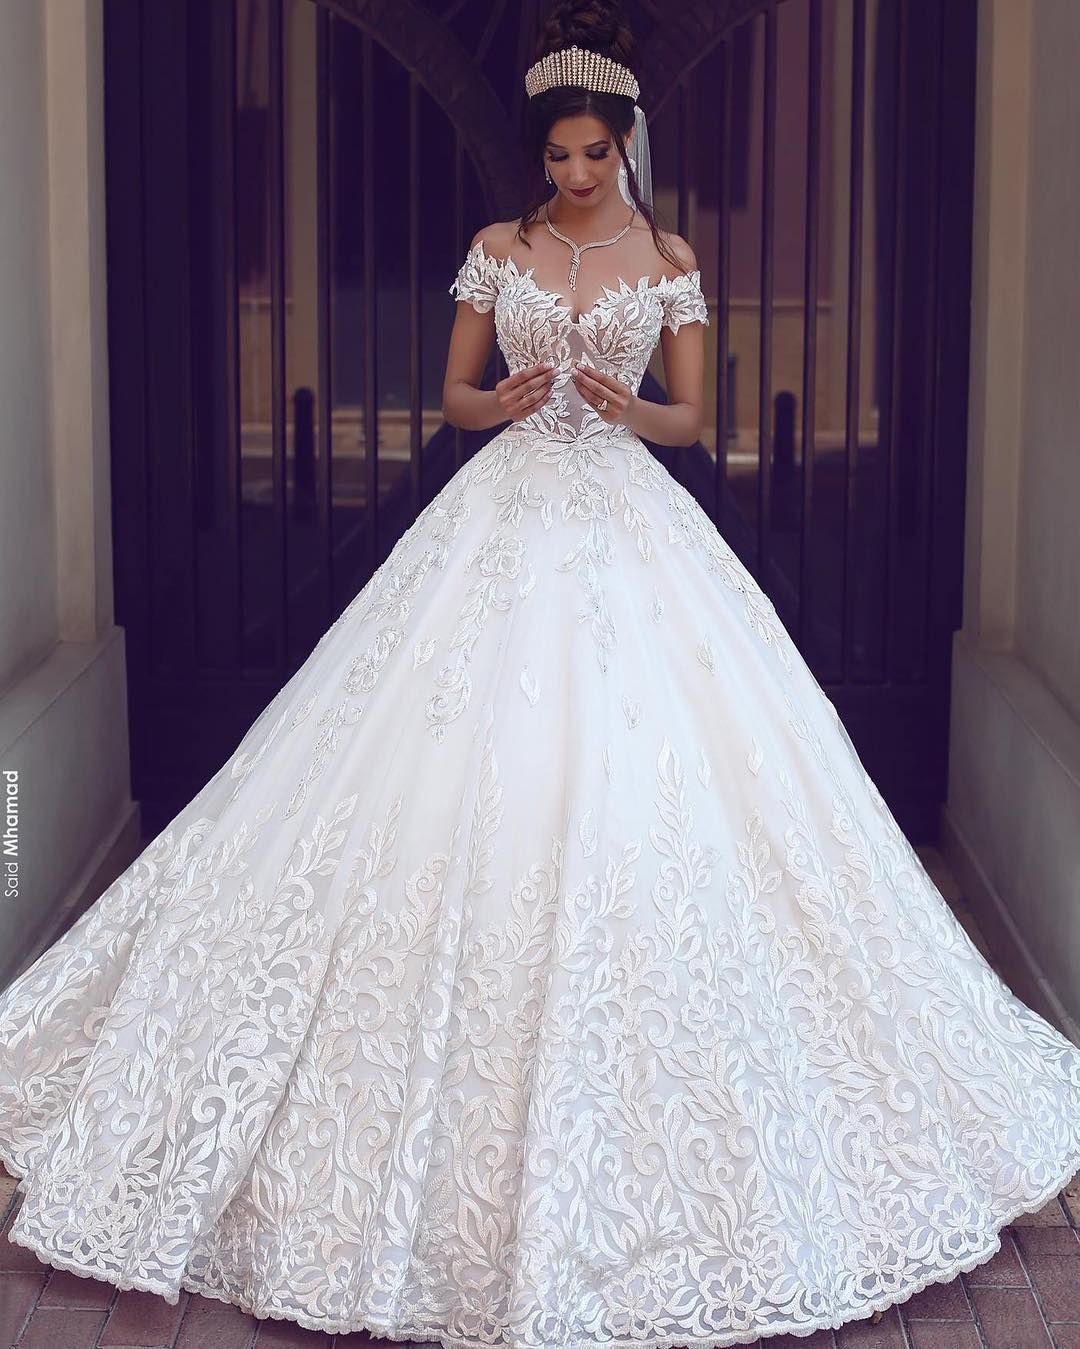 Wedding Amp Bridal Inspiration For The Glamourous Bride D R E A M W E D D I N G 4 U Advertis Cheap Bridal Dresses Ball Gowns Wedding Long Wedding Dresses